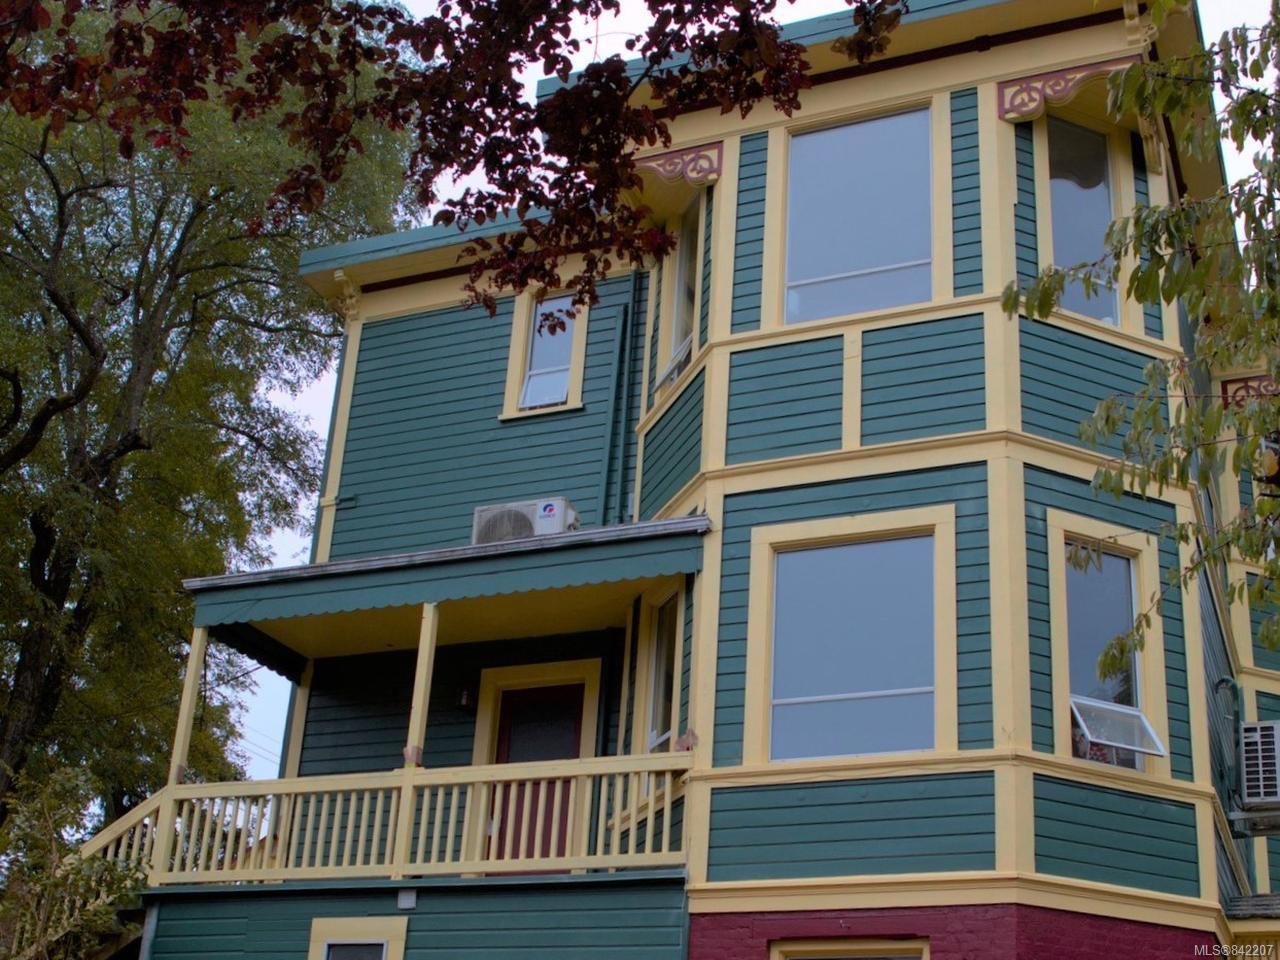 Main Photo: 408 Milford Cres in NANAIMO: Na Old City Triplex for sale (Nanaimo)  : MLS®# 842207